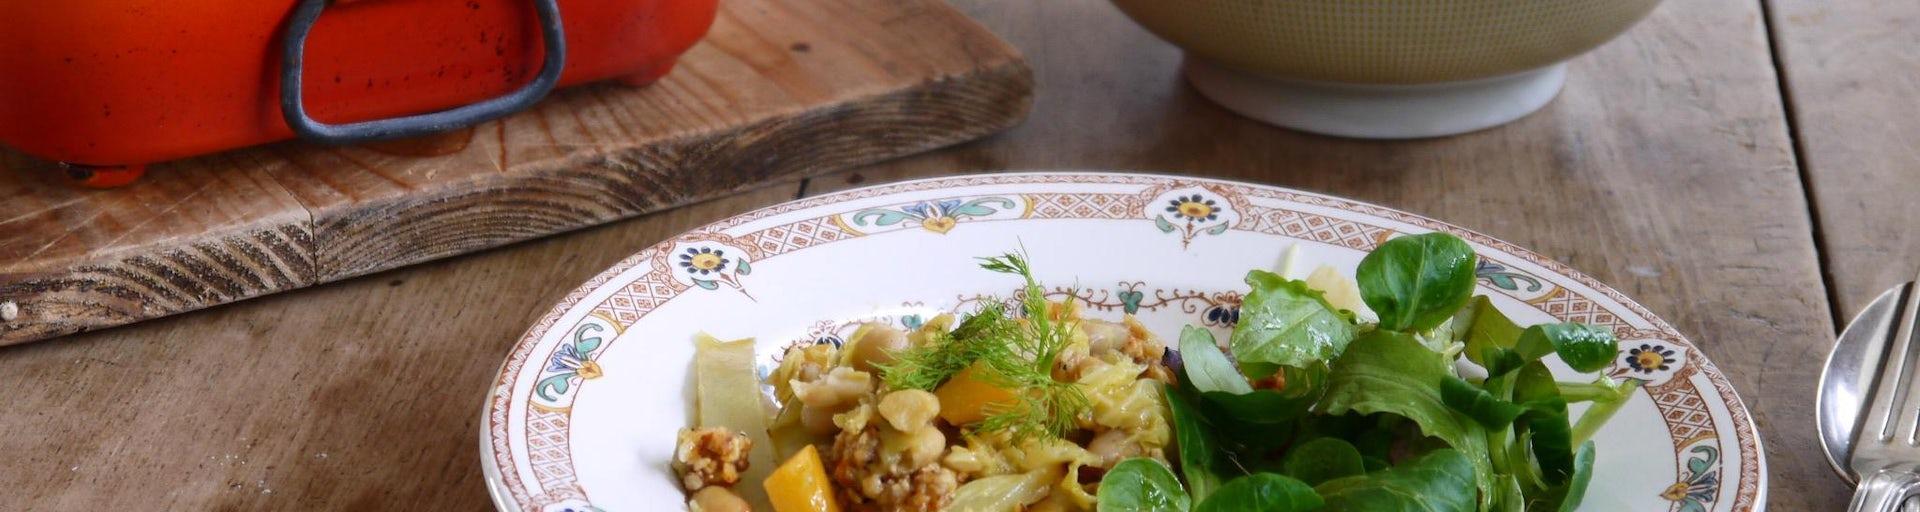 Wk 11 wintergroenten crumble noten kaas